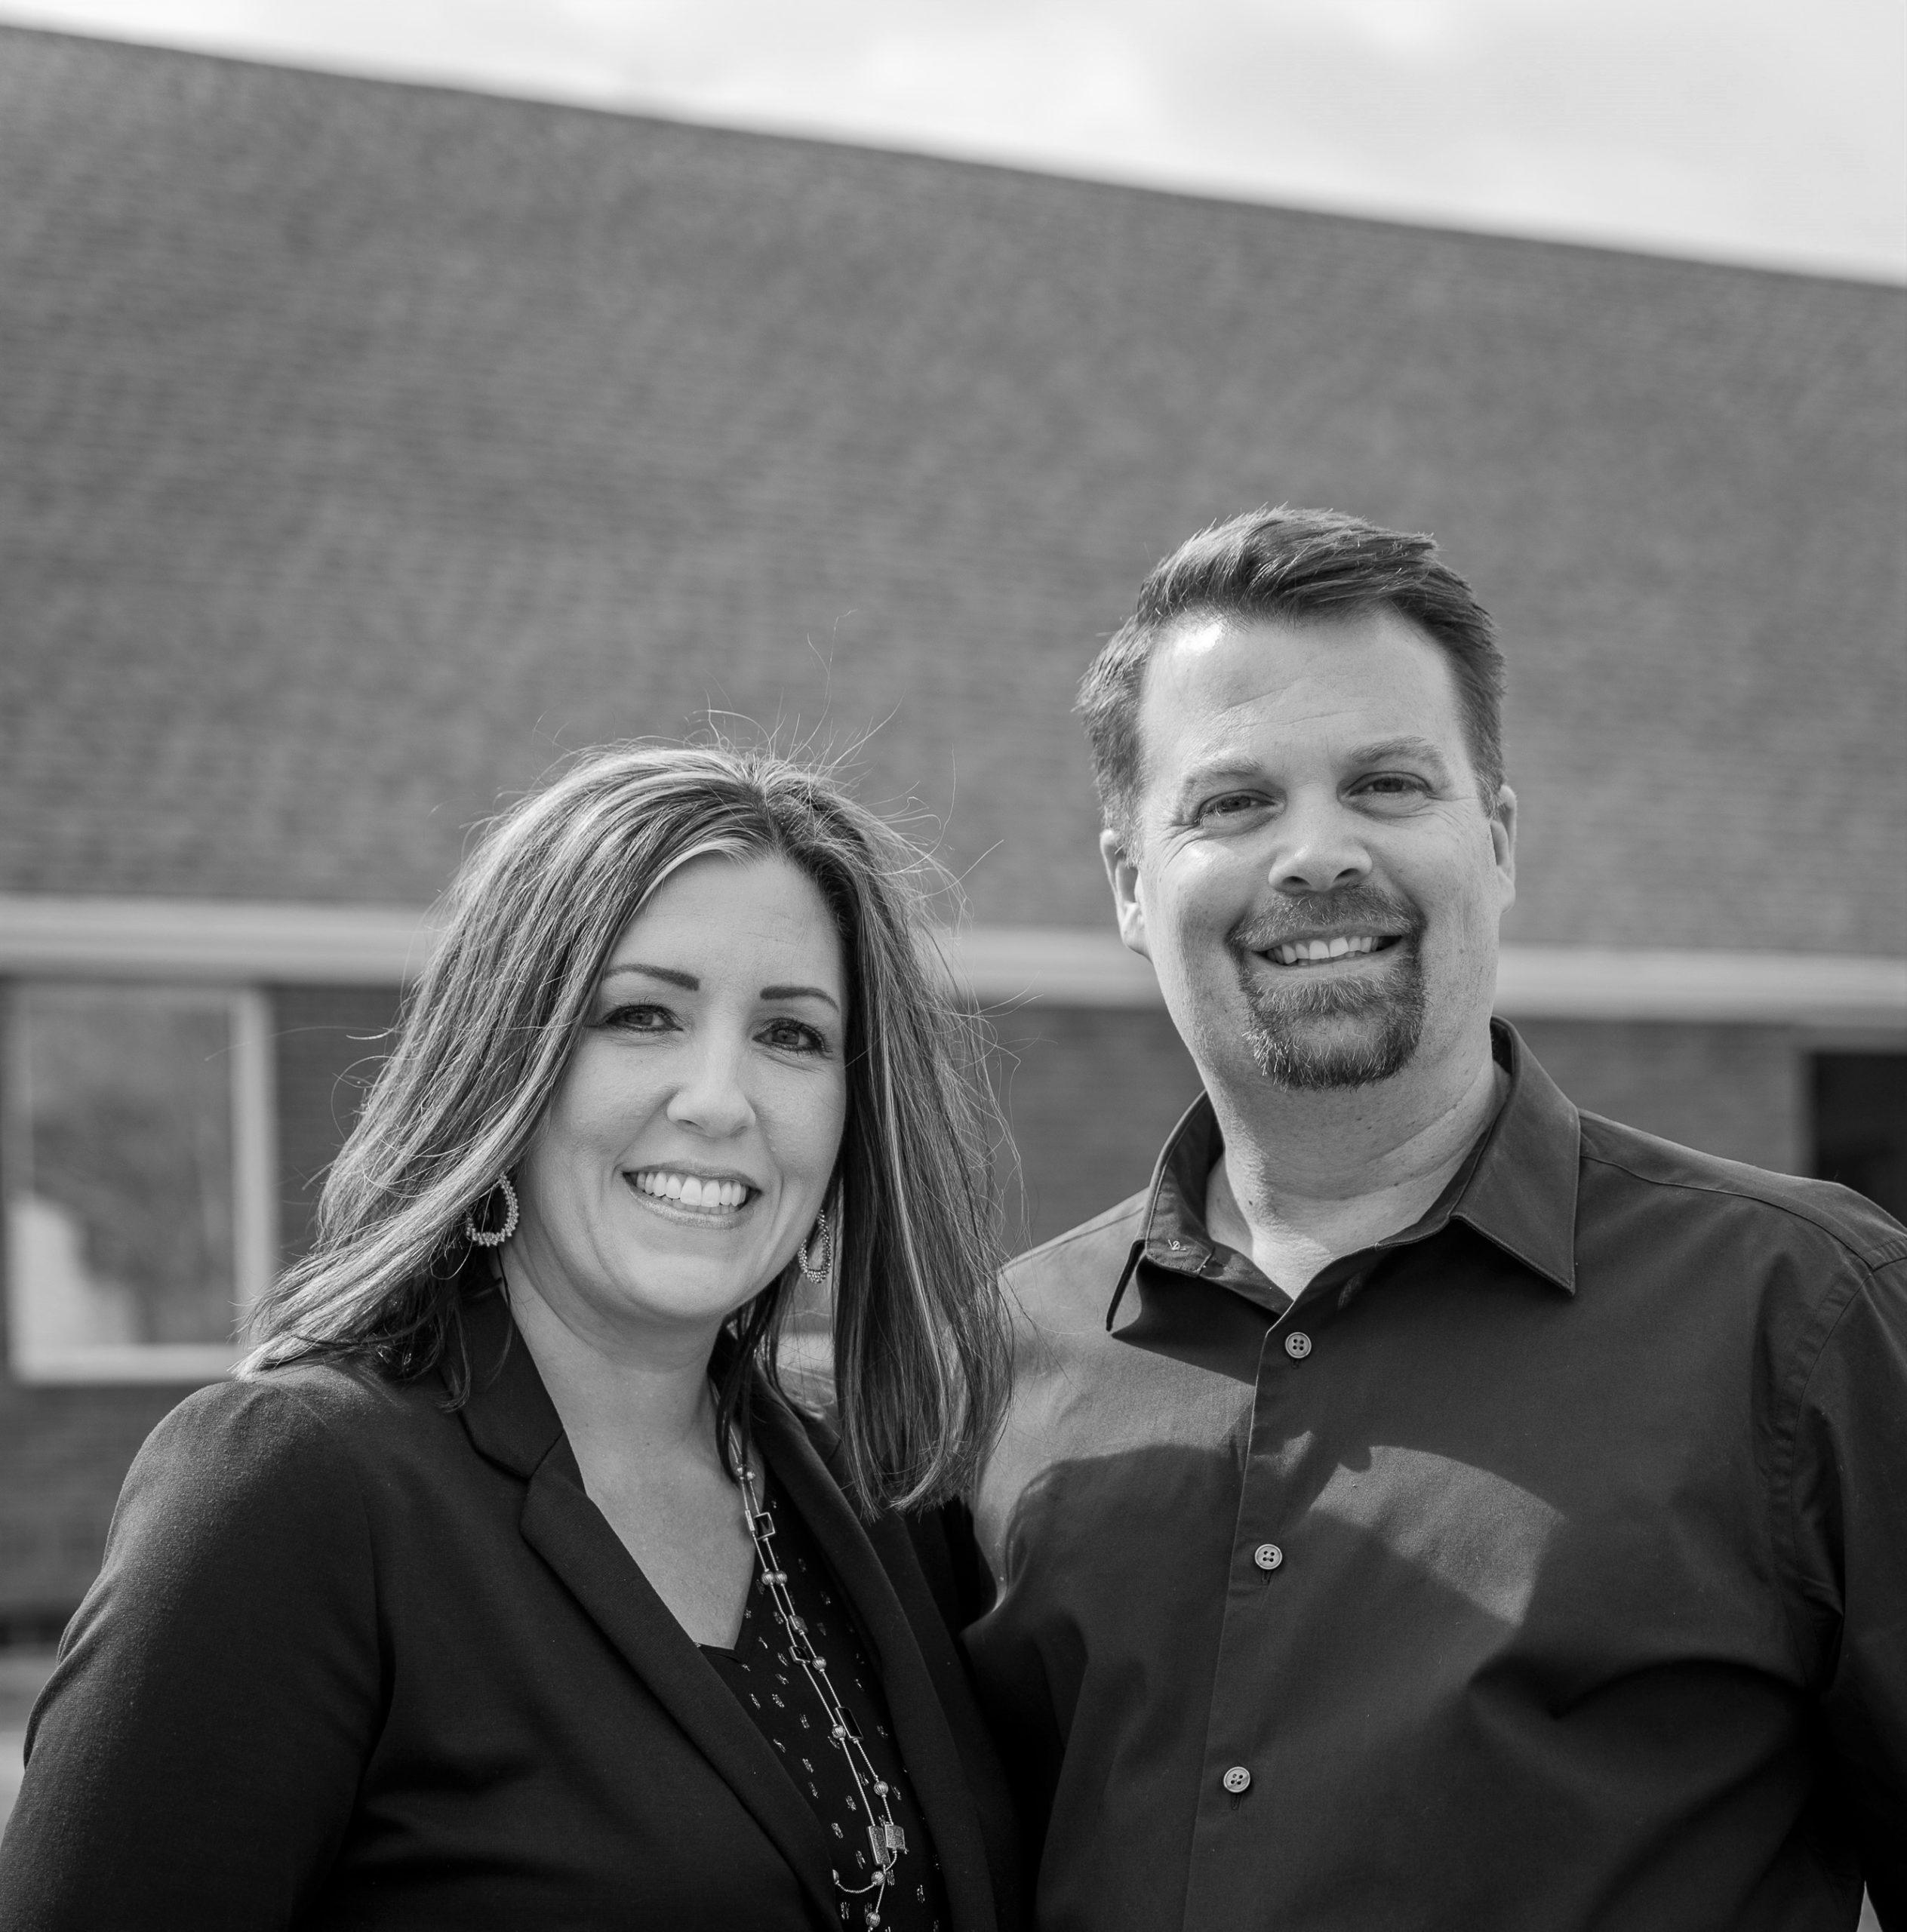 Sean and Heidi, Lead Pastors at Faith Family Billings Church, Billings, MT